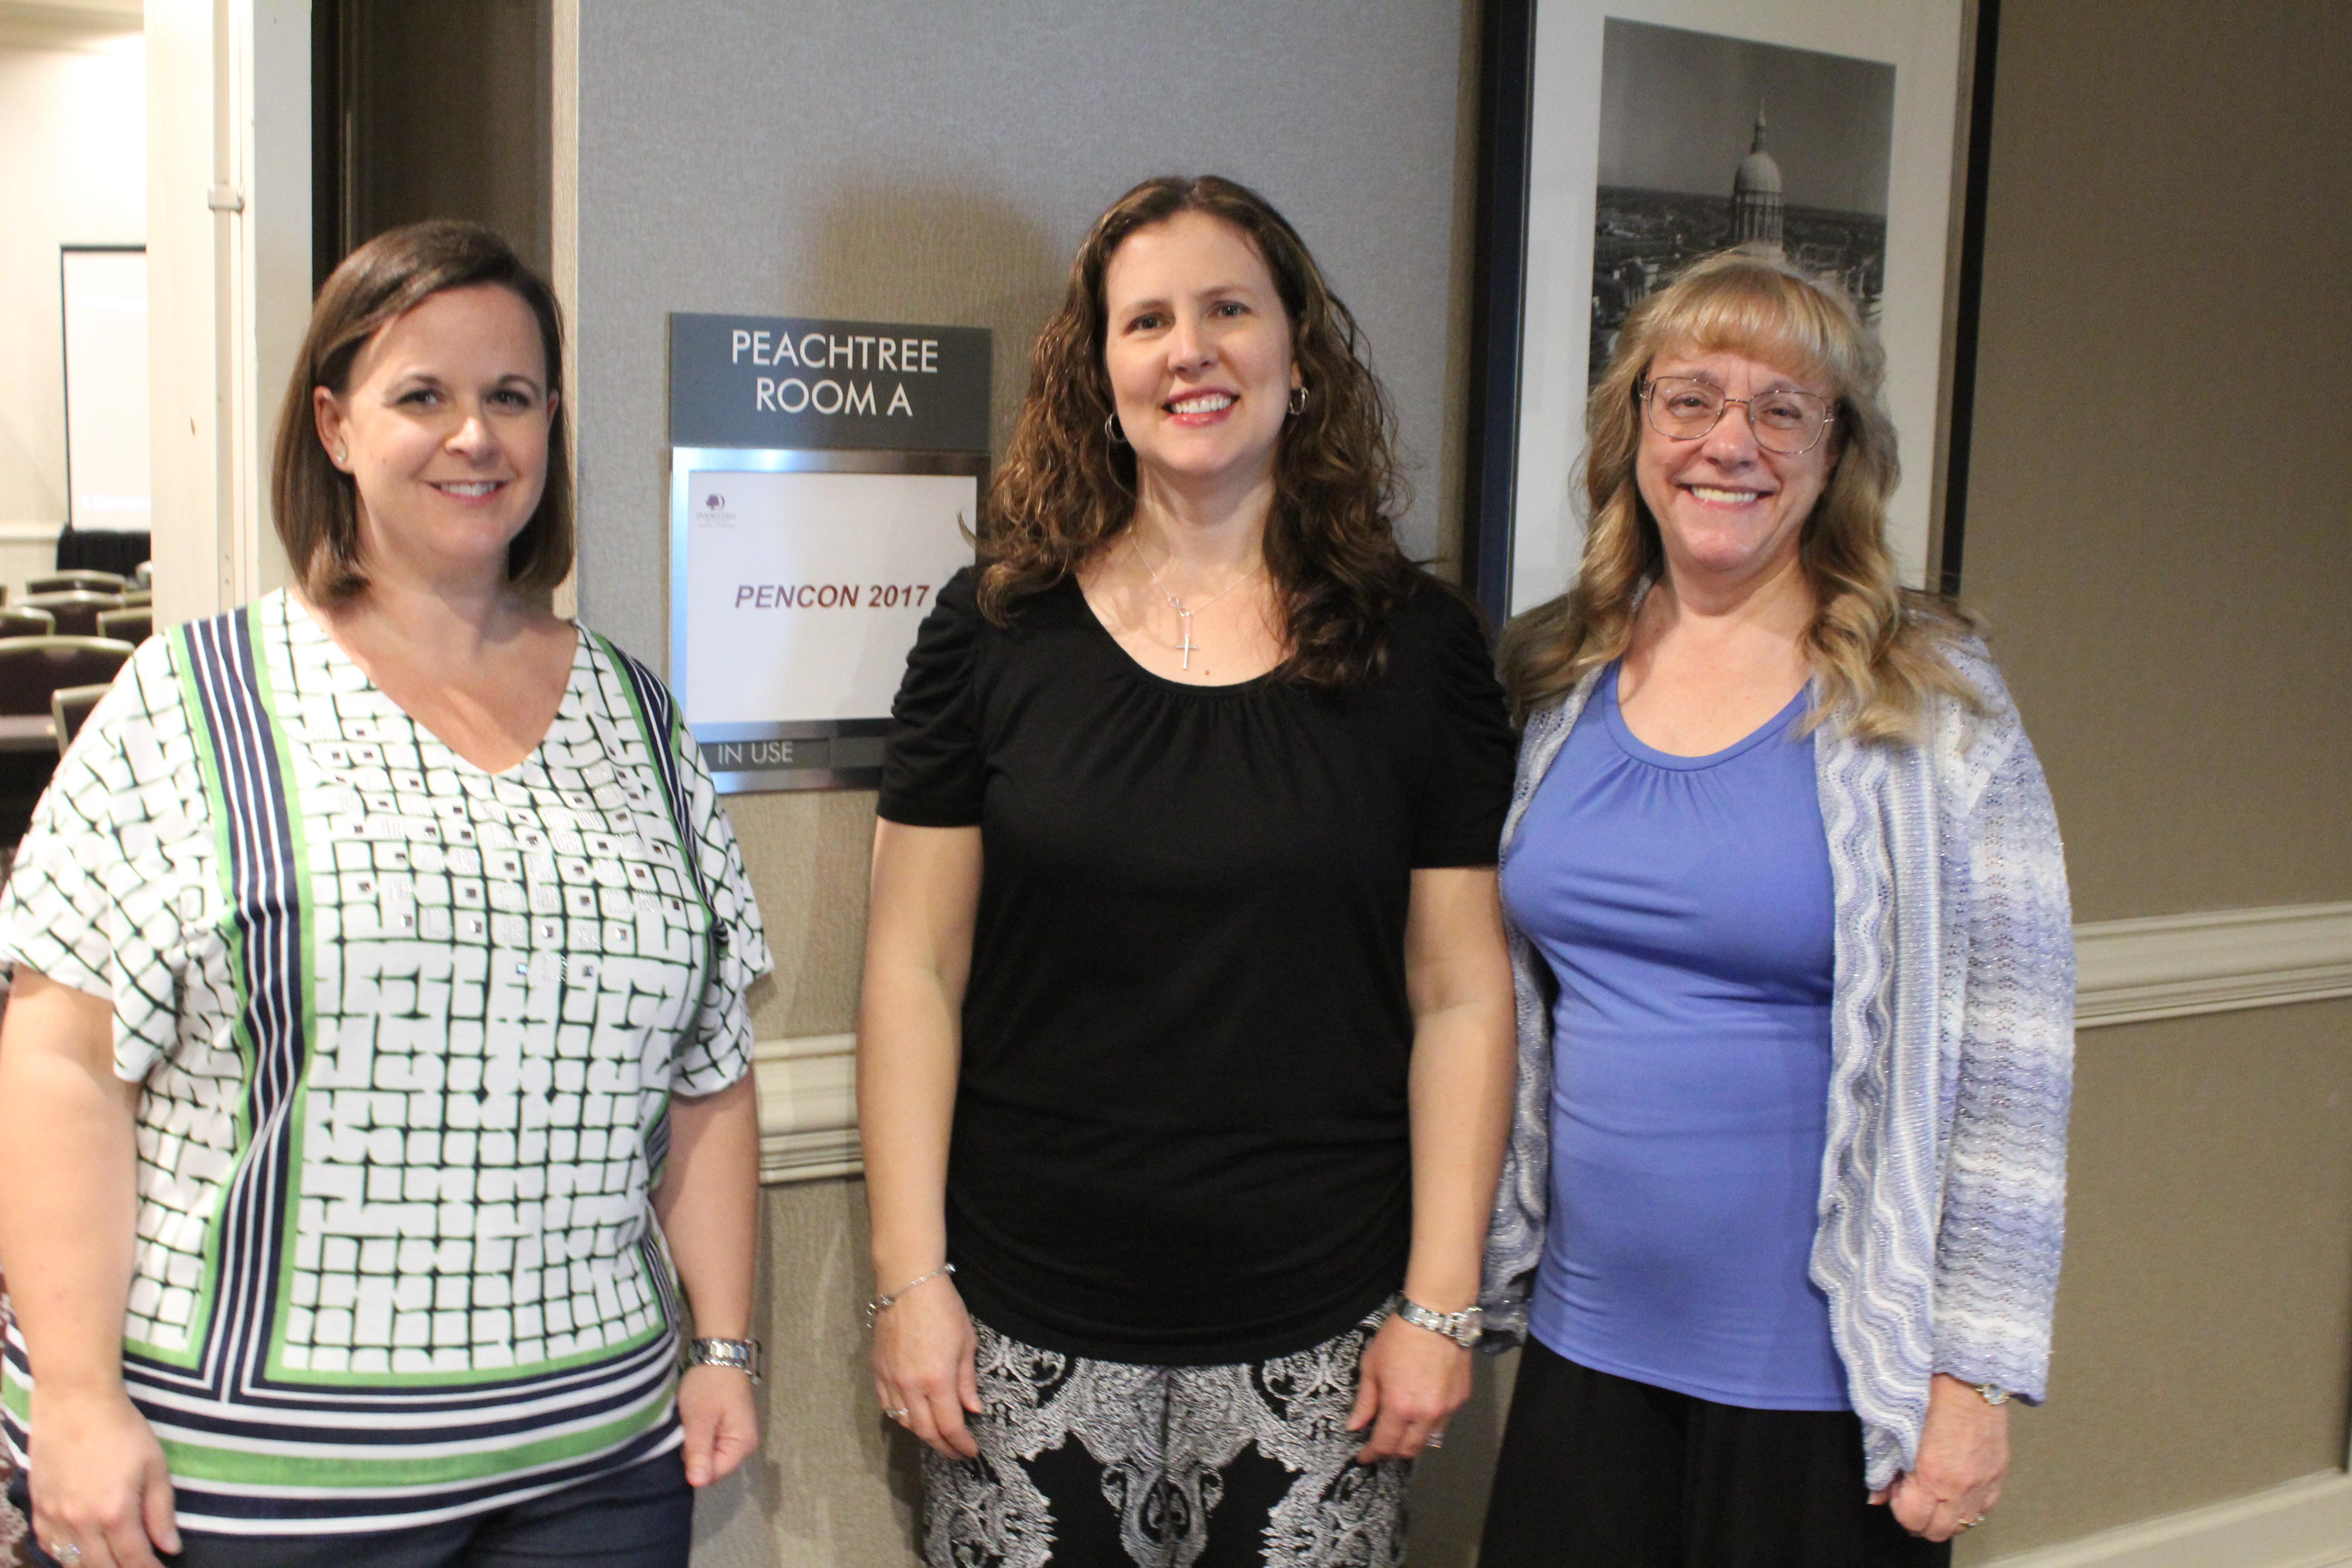 Co-owners: Christi McGuire, Jenne Acevedo, Kathy Ide